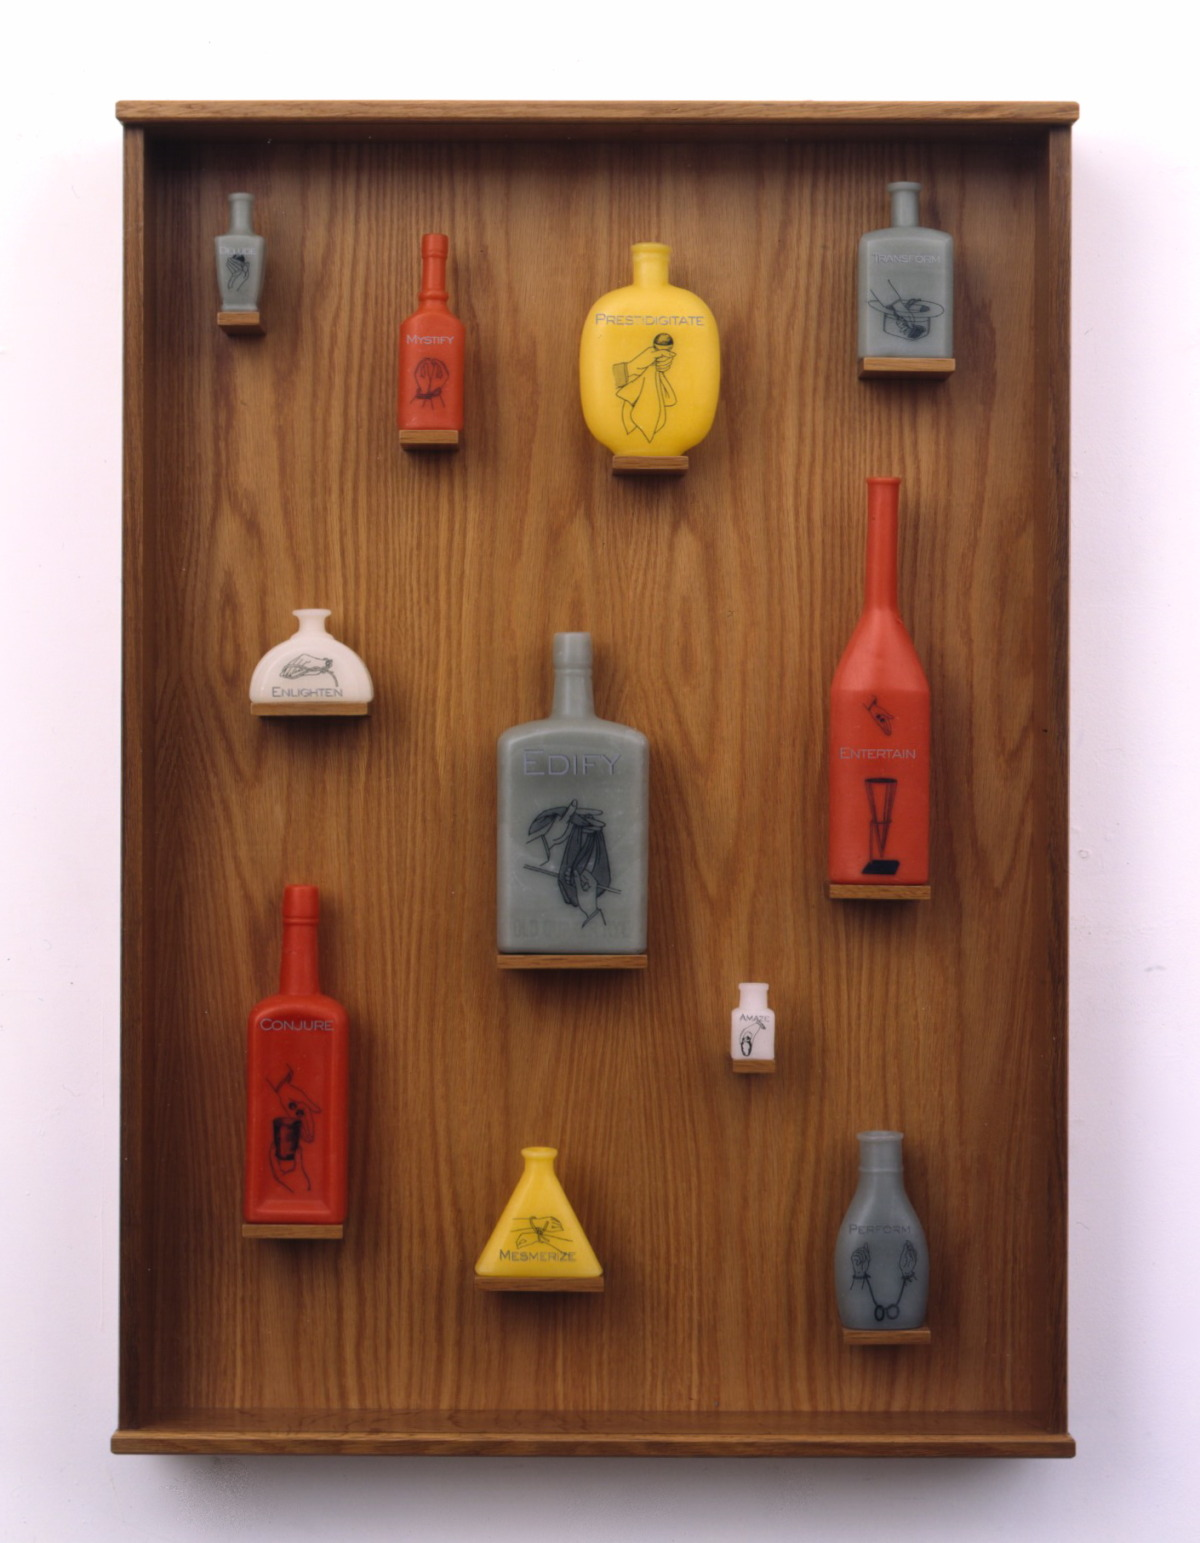 Hand Signals 3, 1999: wax, wood, metal leaf, Plexiglas, 20 x 16 x 3 inches